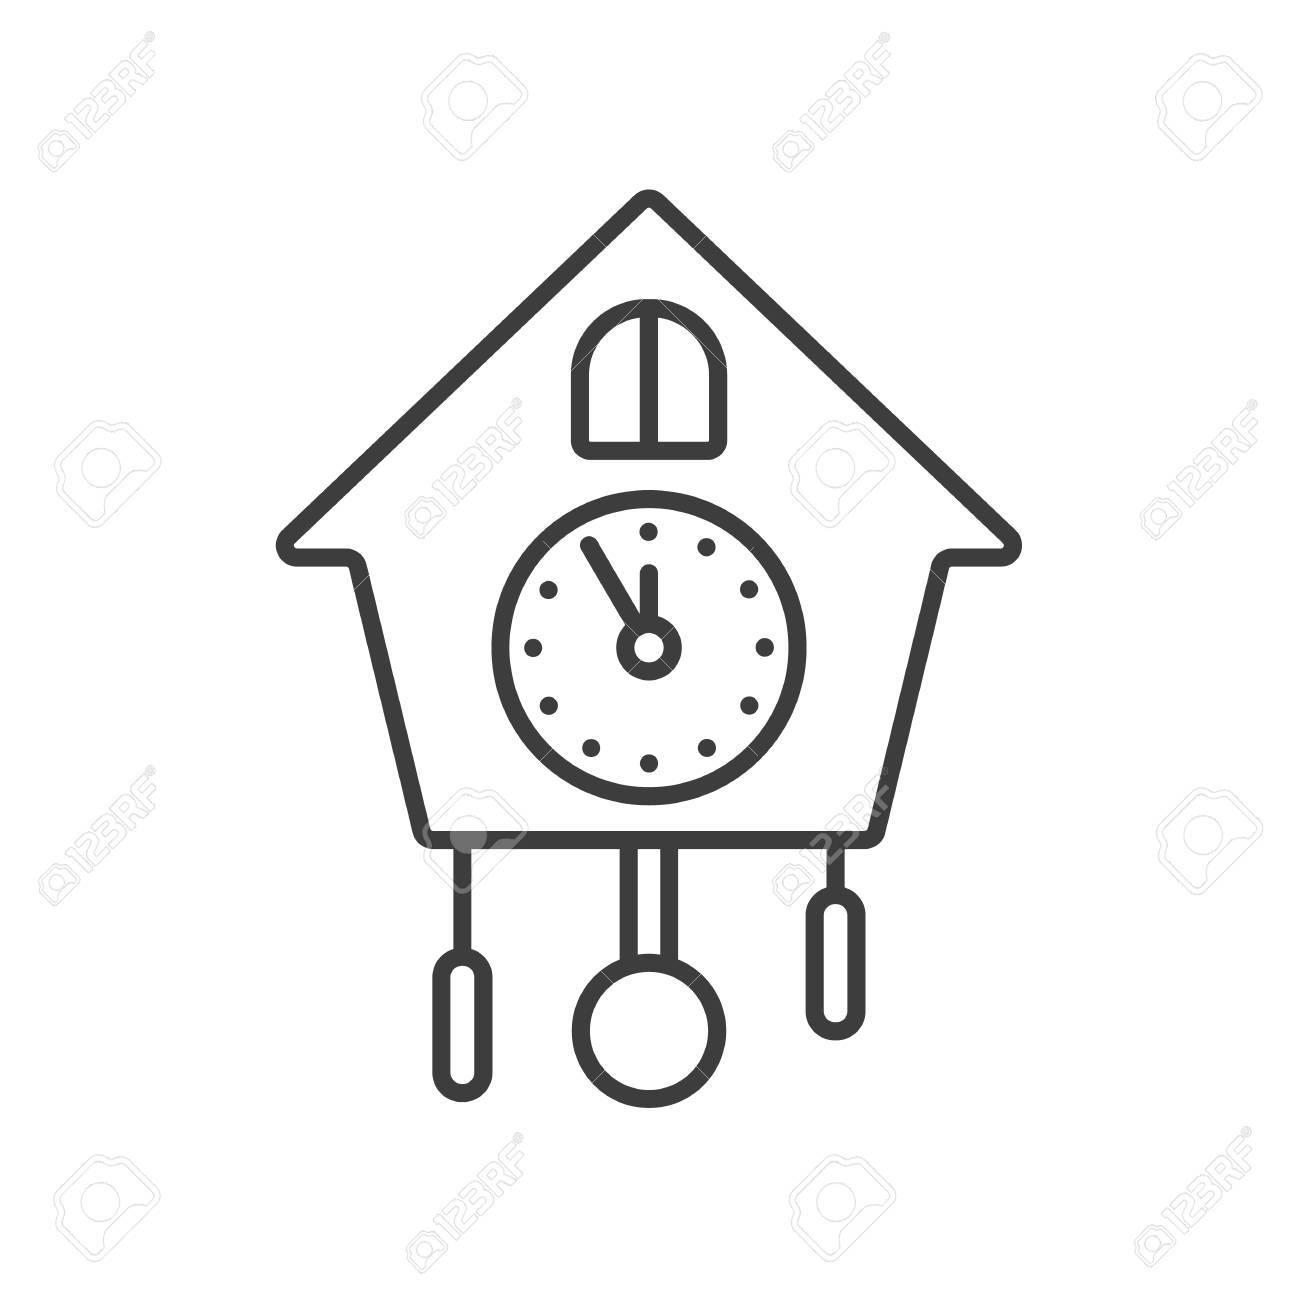 Wall Clock Linear Icon Thin Line Illustration Contour Symbol